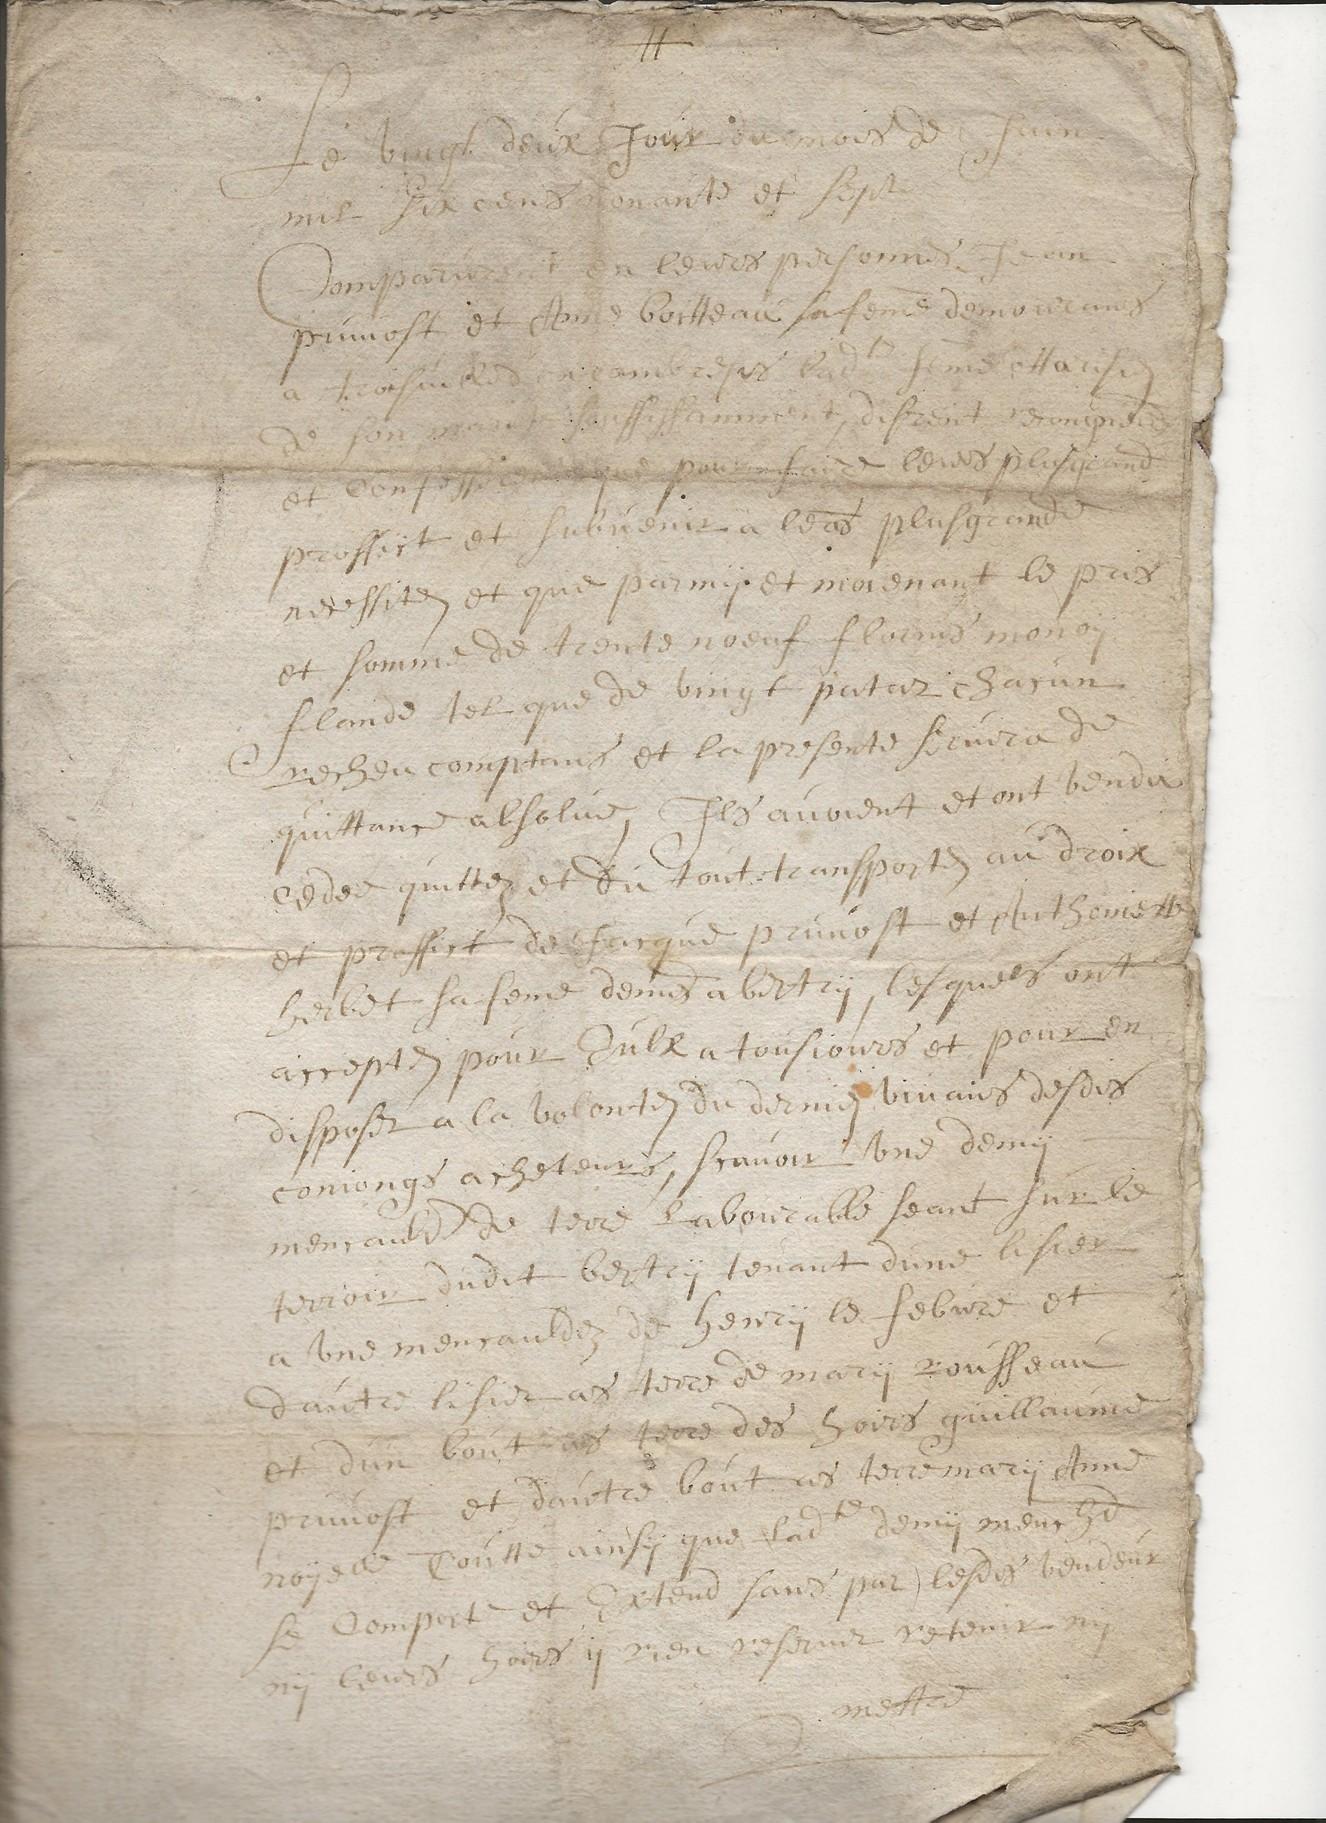 1697 acte concernant jean pruvot 2